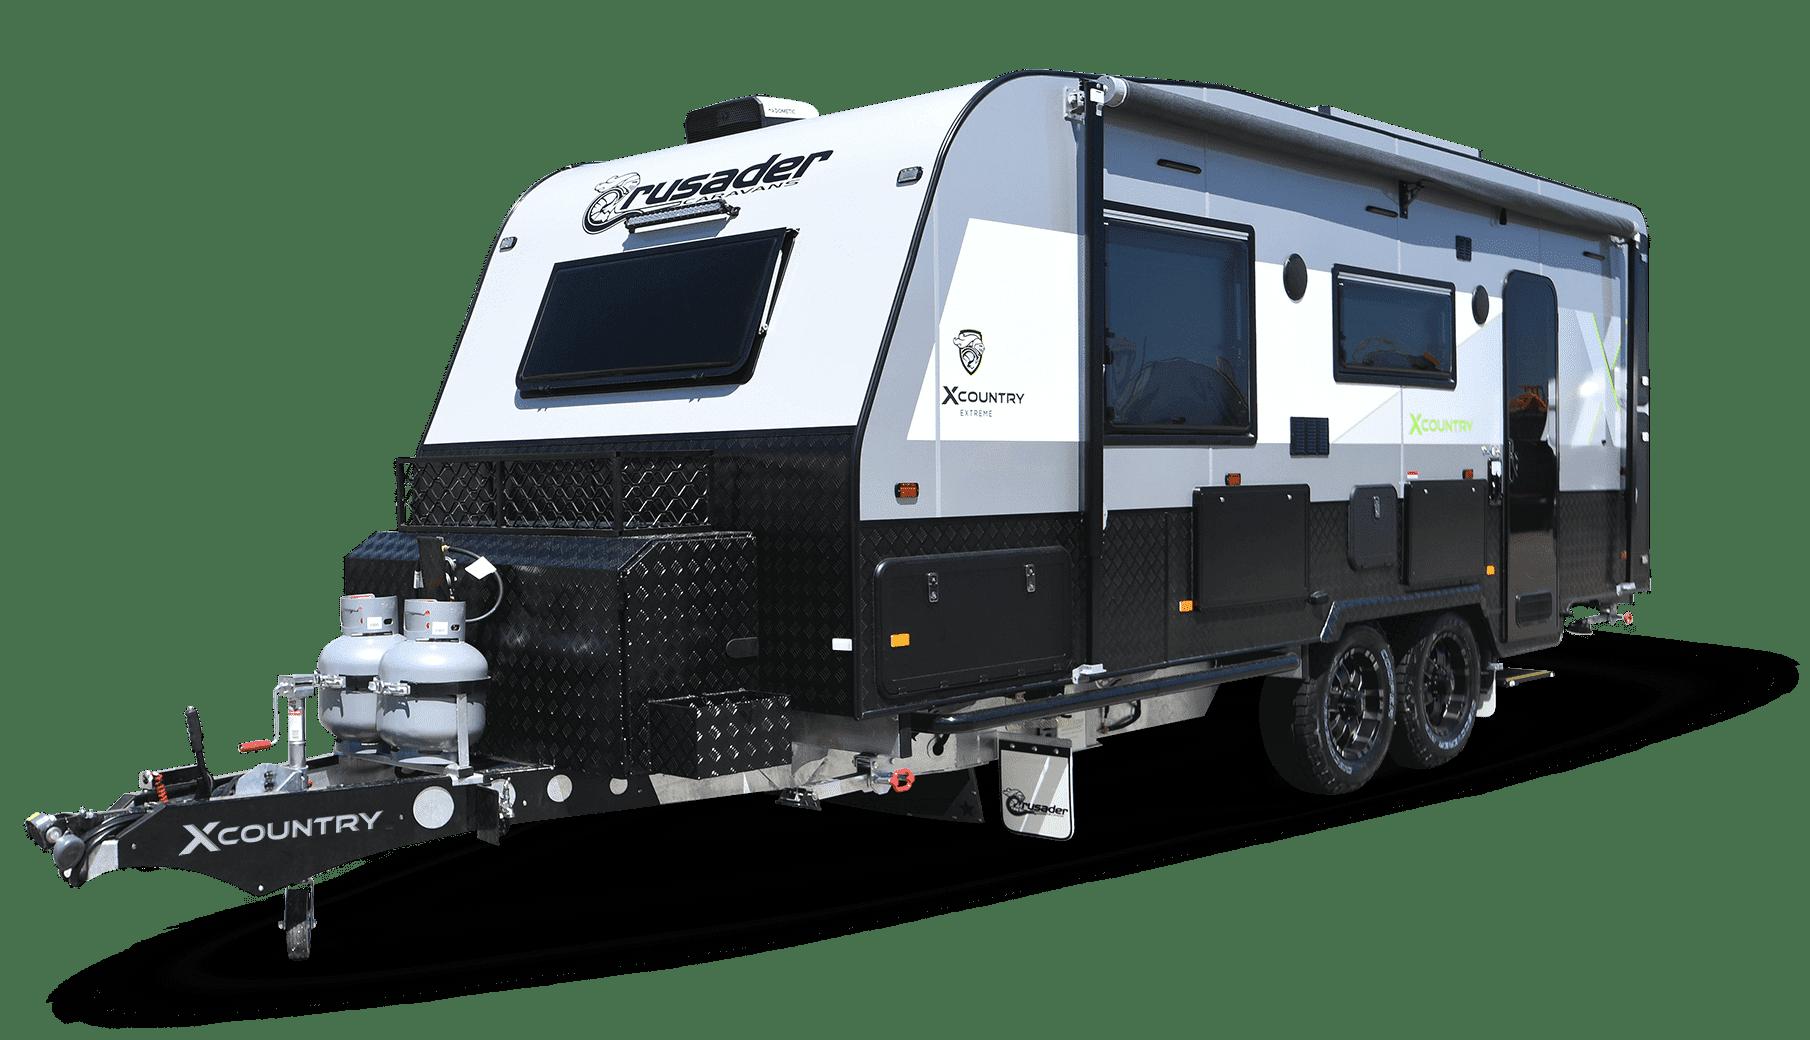 Crusader XC Extreme new caravan for sale.